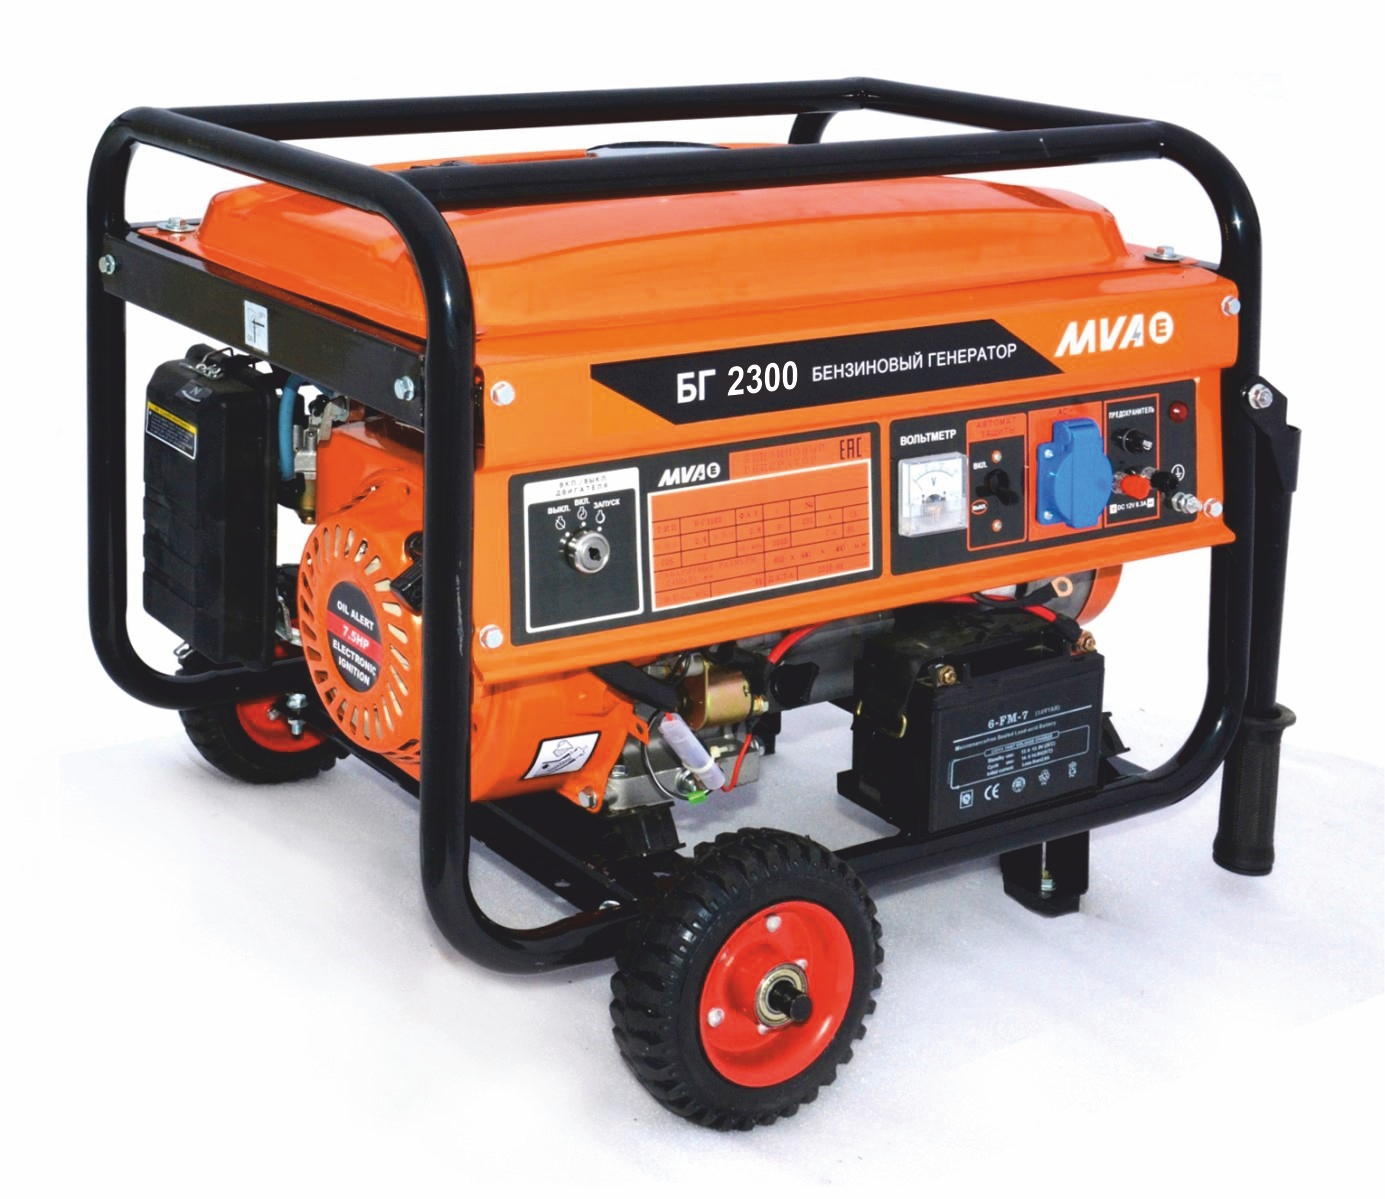 Бензиновый генератор Mvae БГ 2300